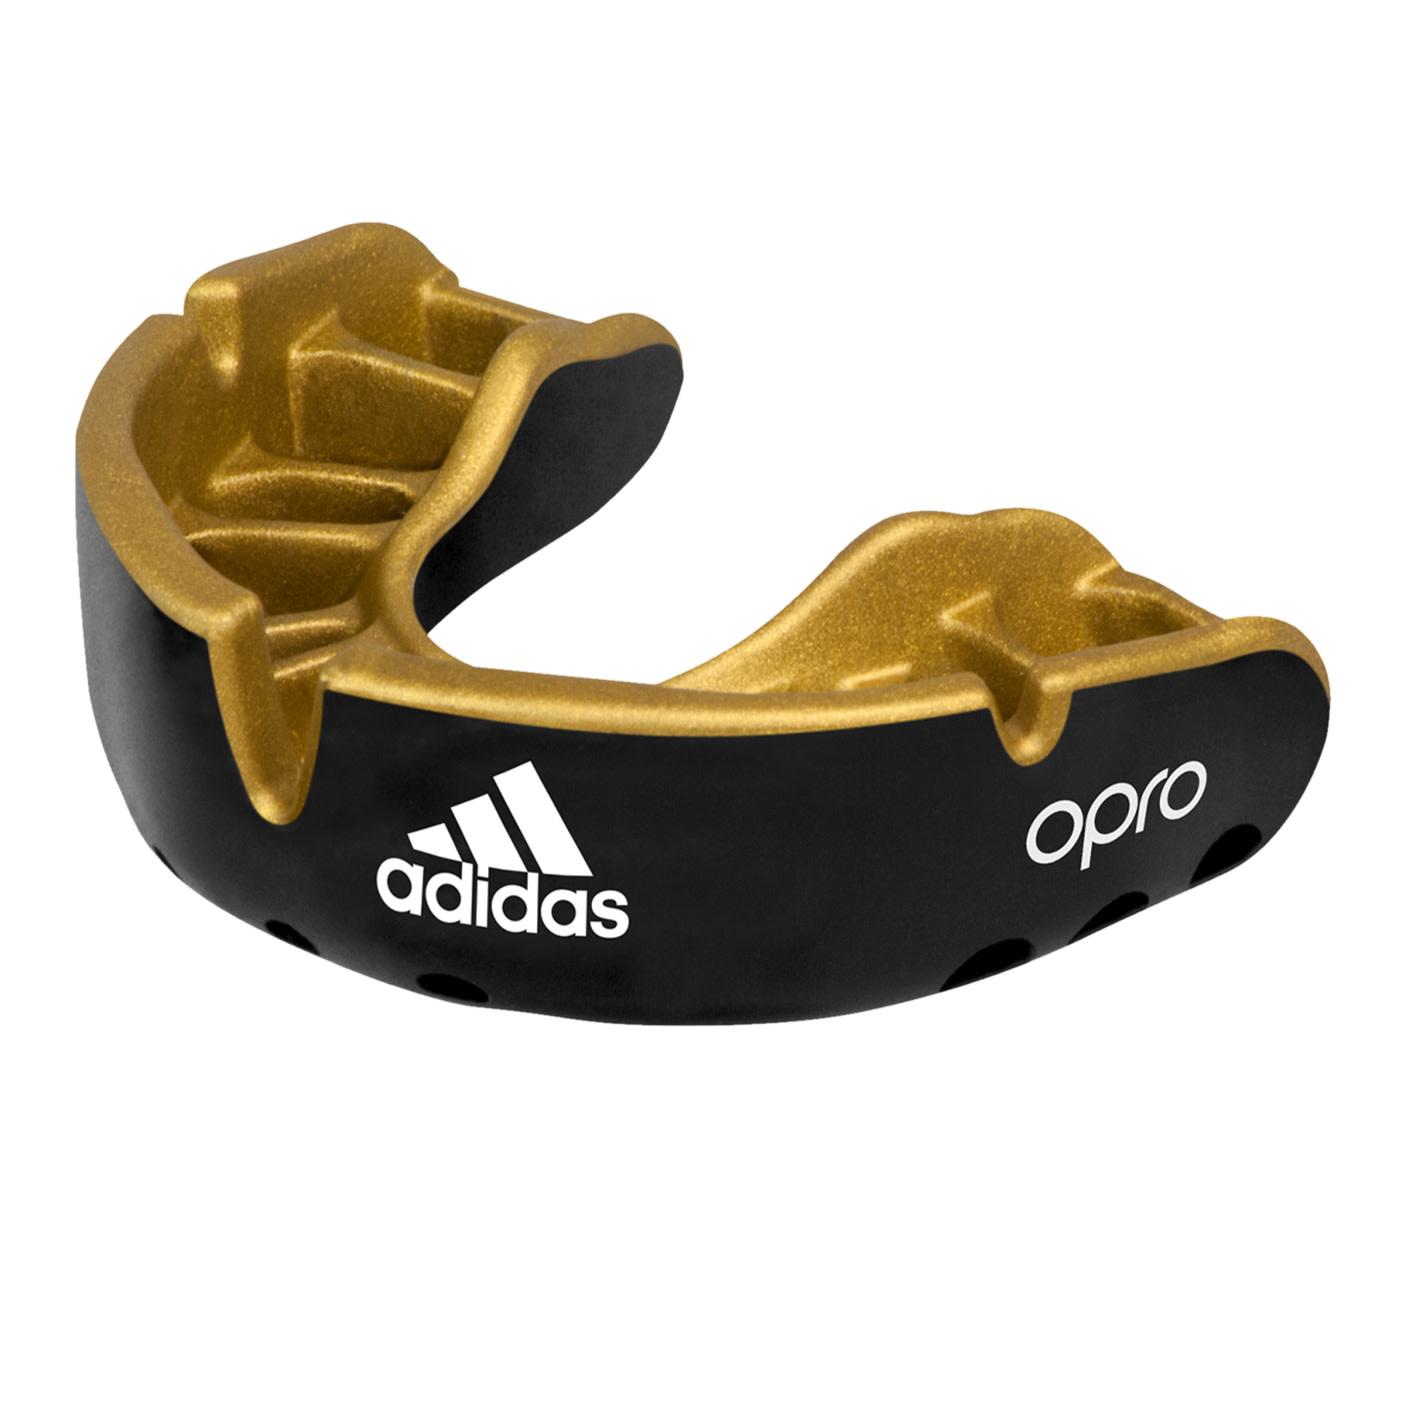 Adidas Adidas mouthguard gold zwart